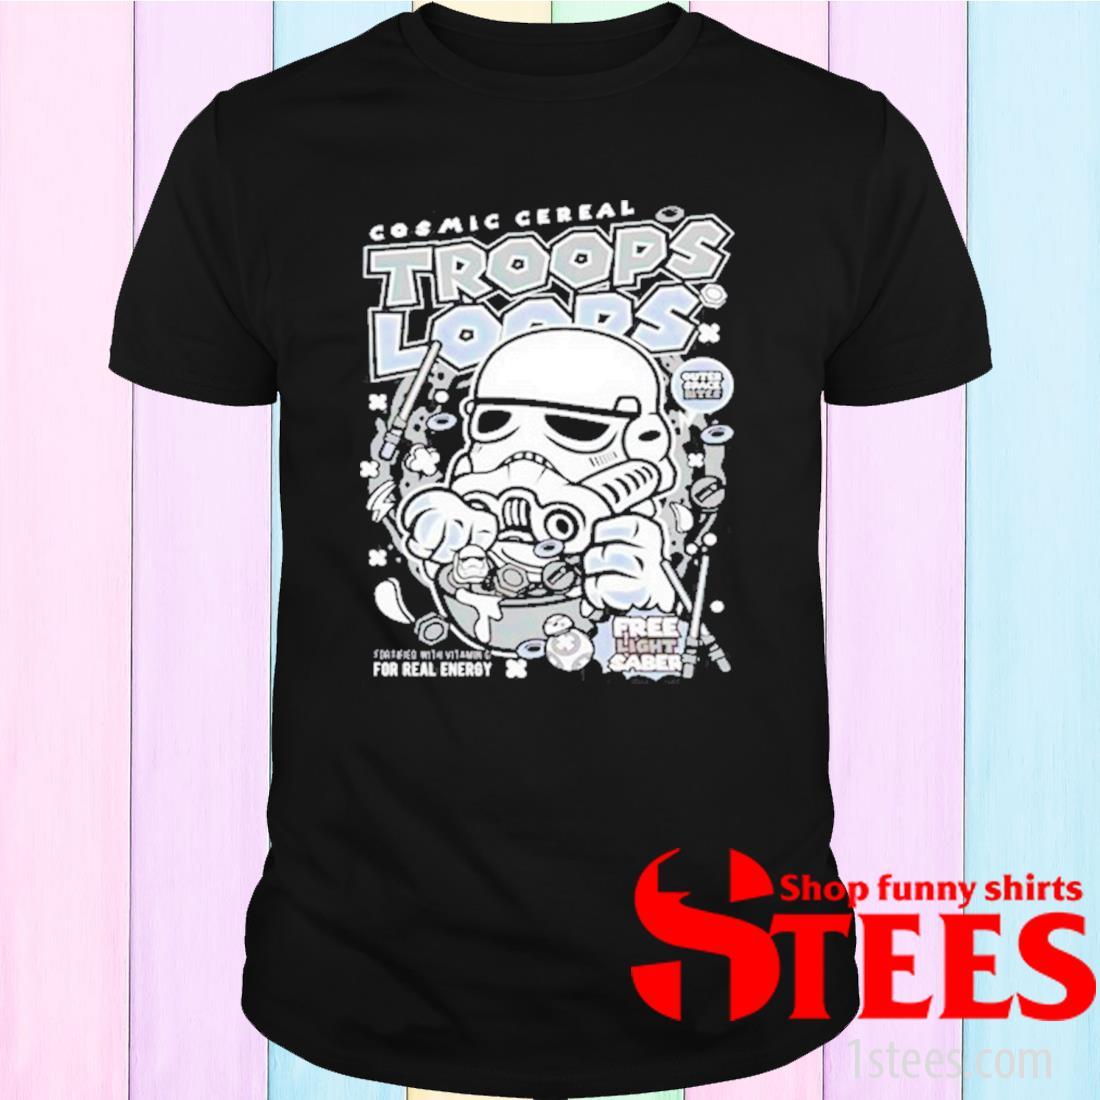 Cosmic Cereal Trooper Loops Shirt